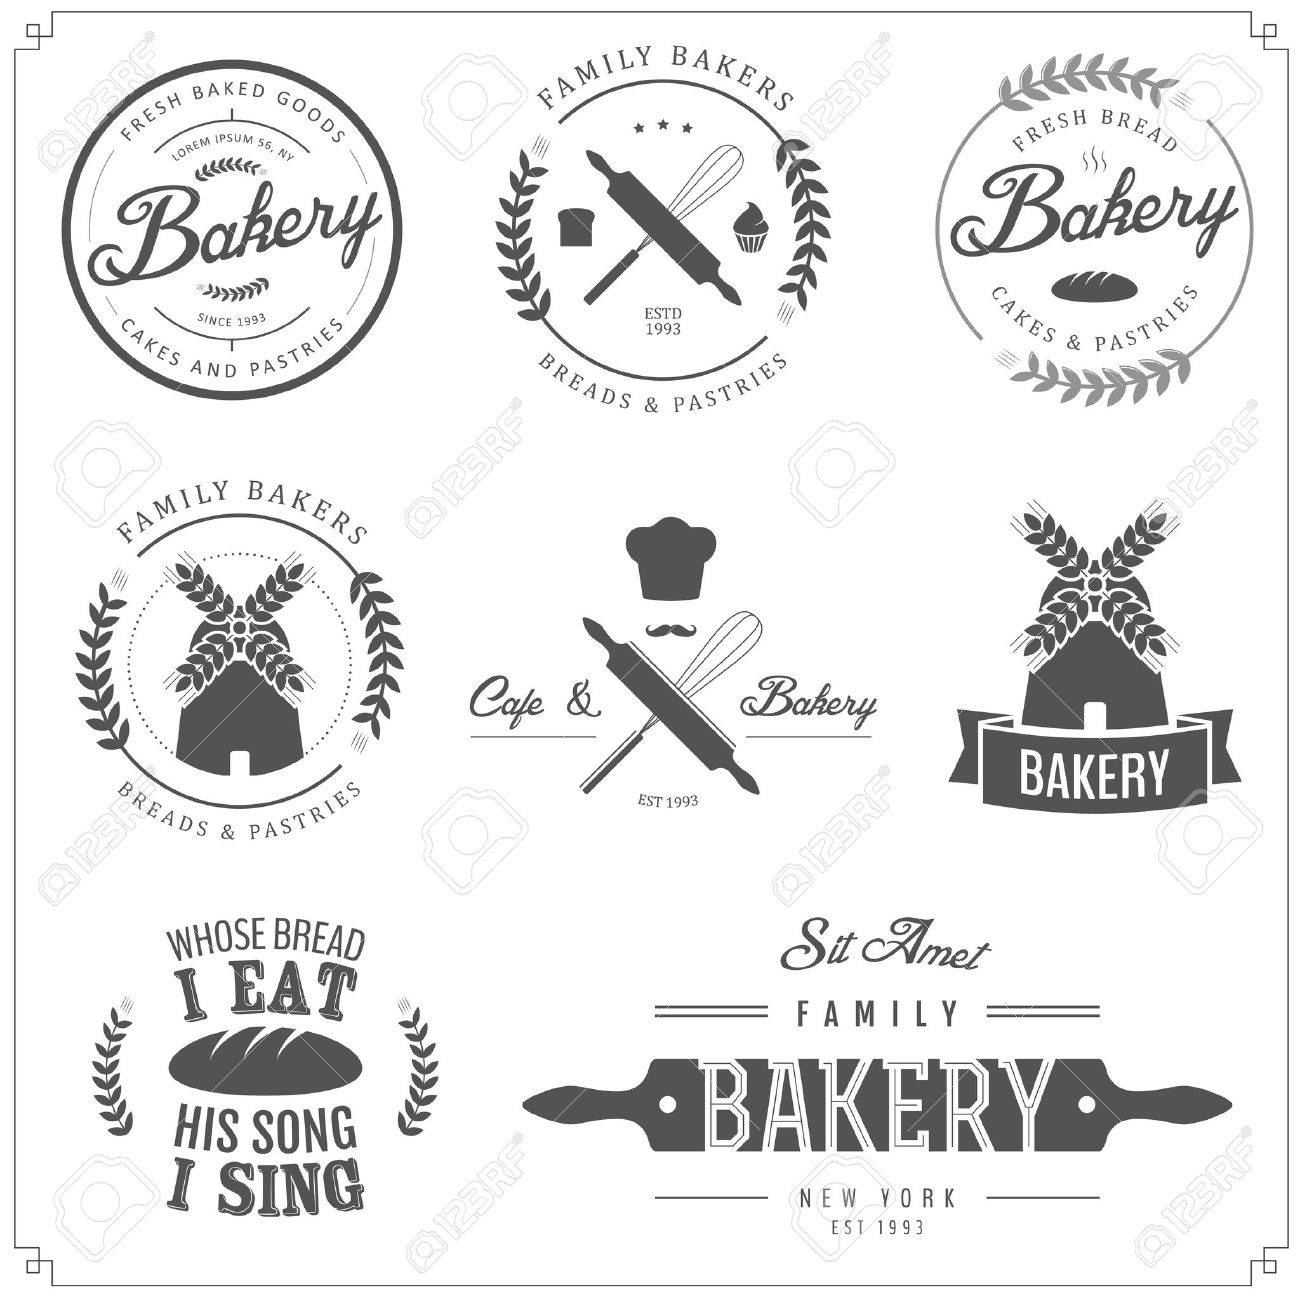 Set of bakery labels, badges and design elements - 18390365